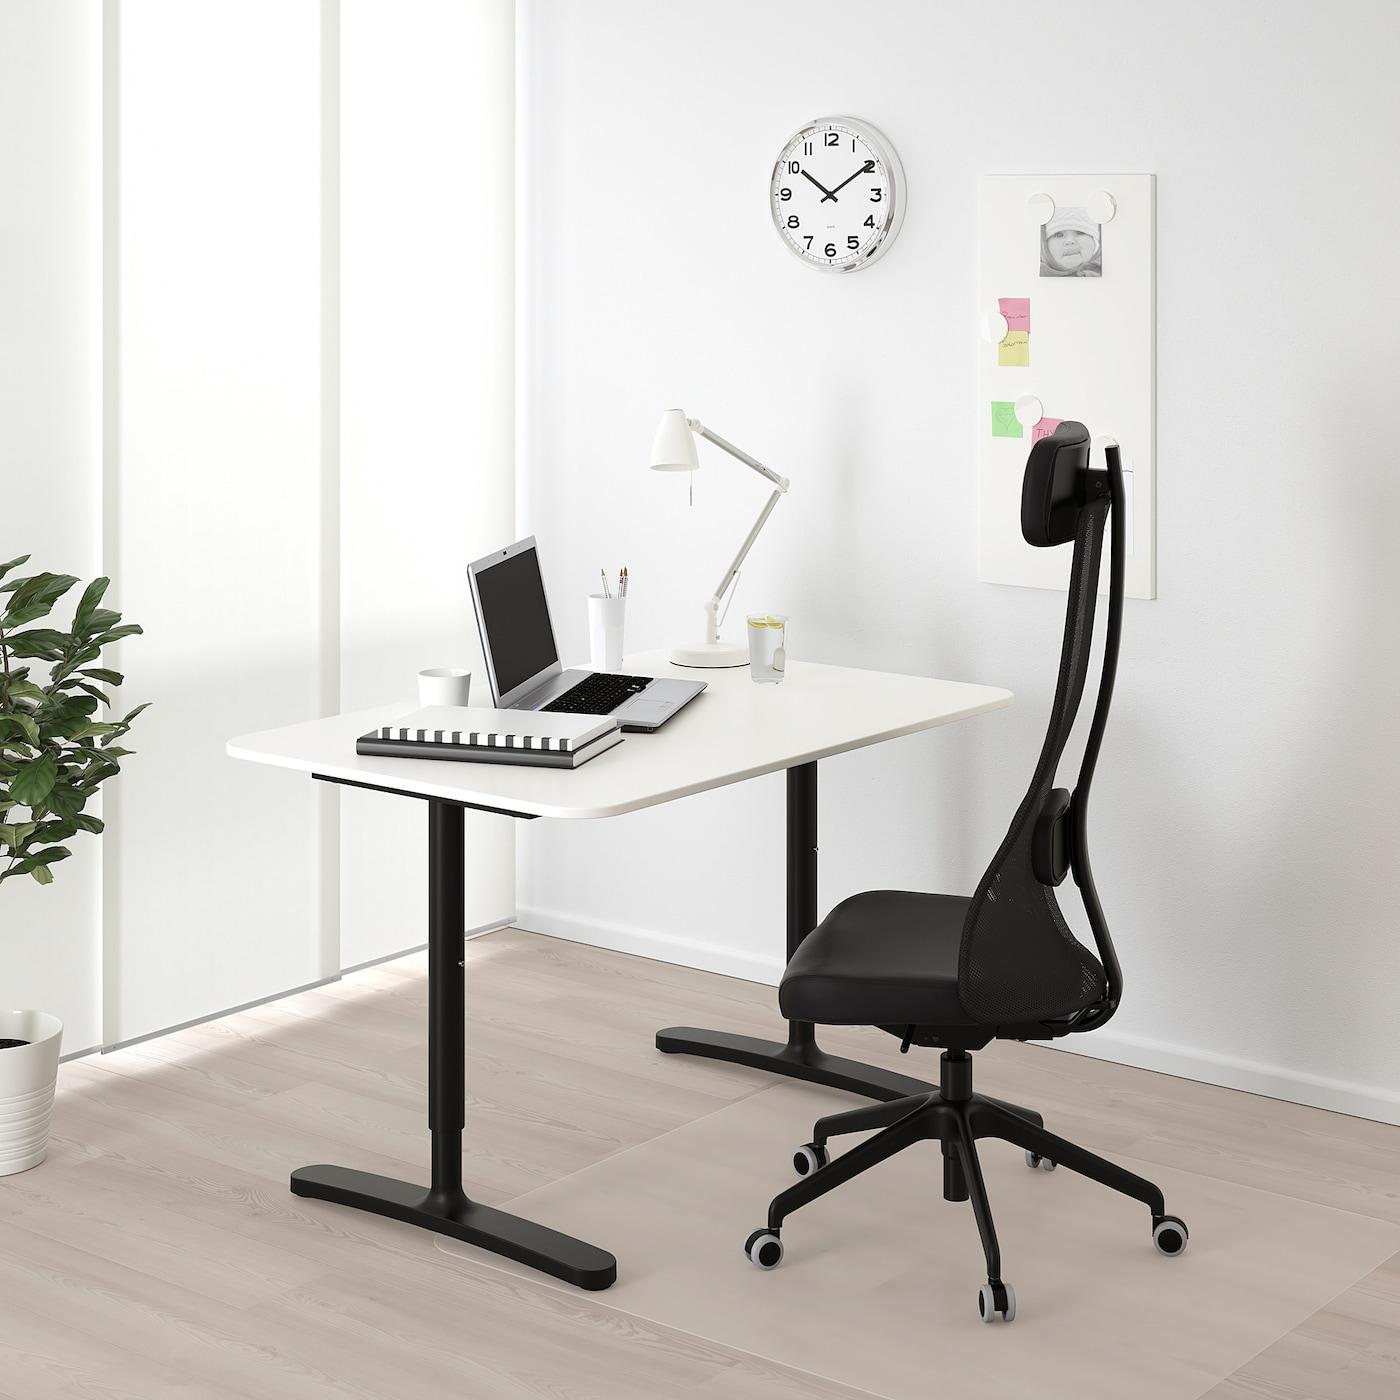 "BEKANT desk white/black 47 1/4 "" 31 1/2 "" 25 5/8 "" 33 1/2 "" 220 lb 7 oz"